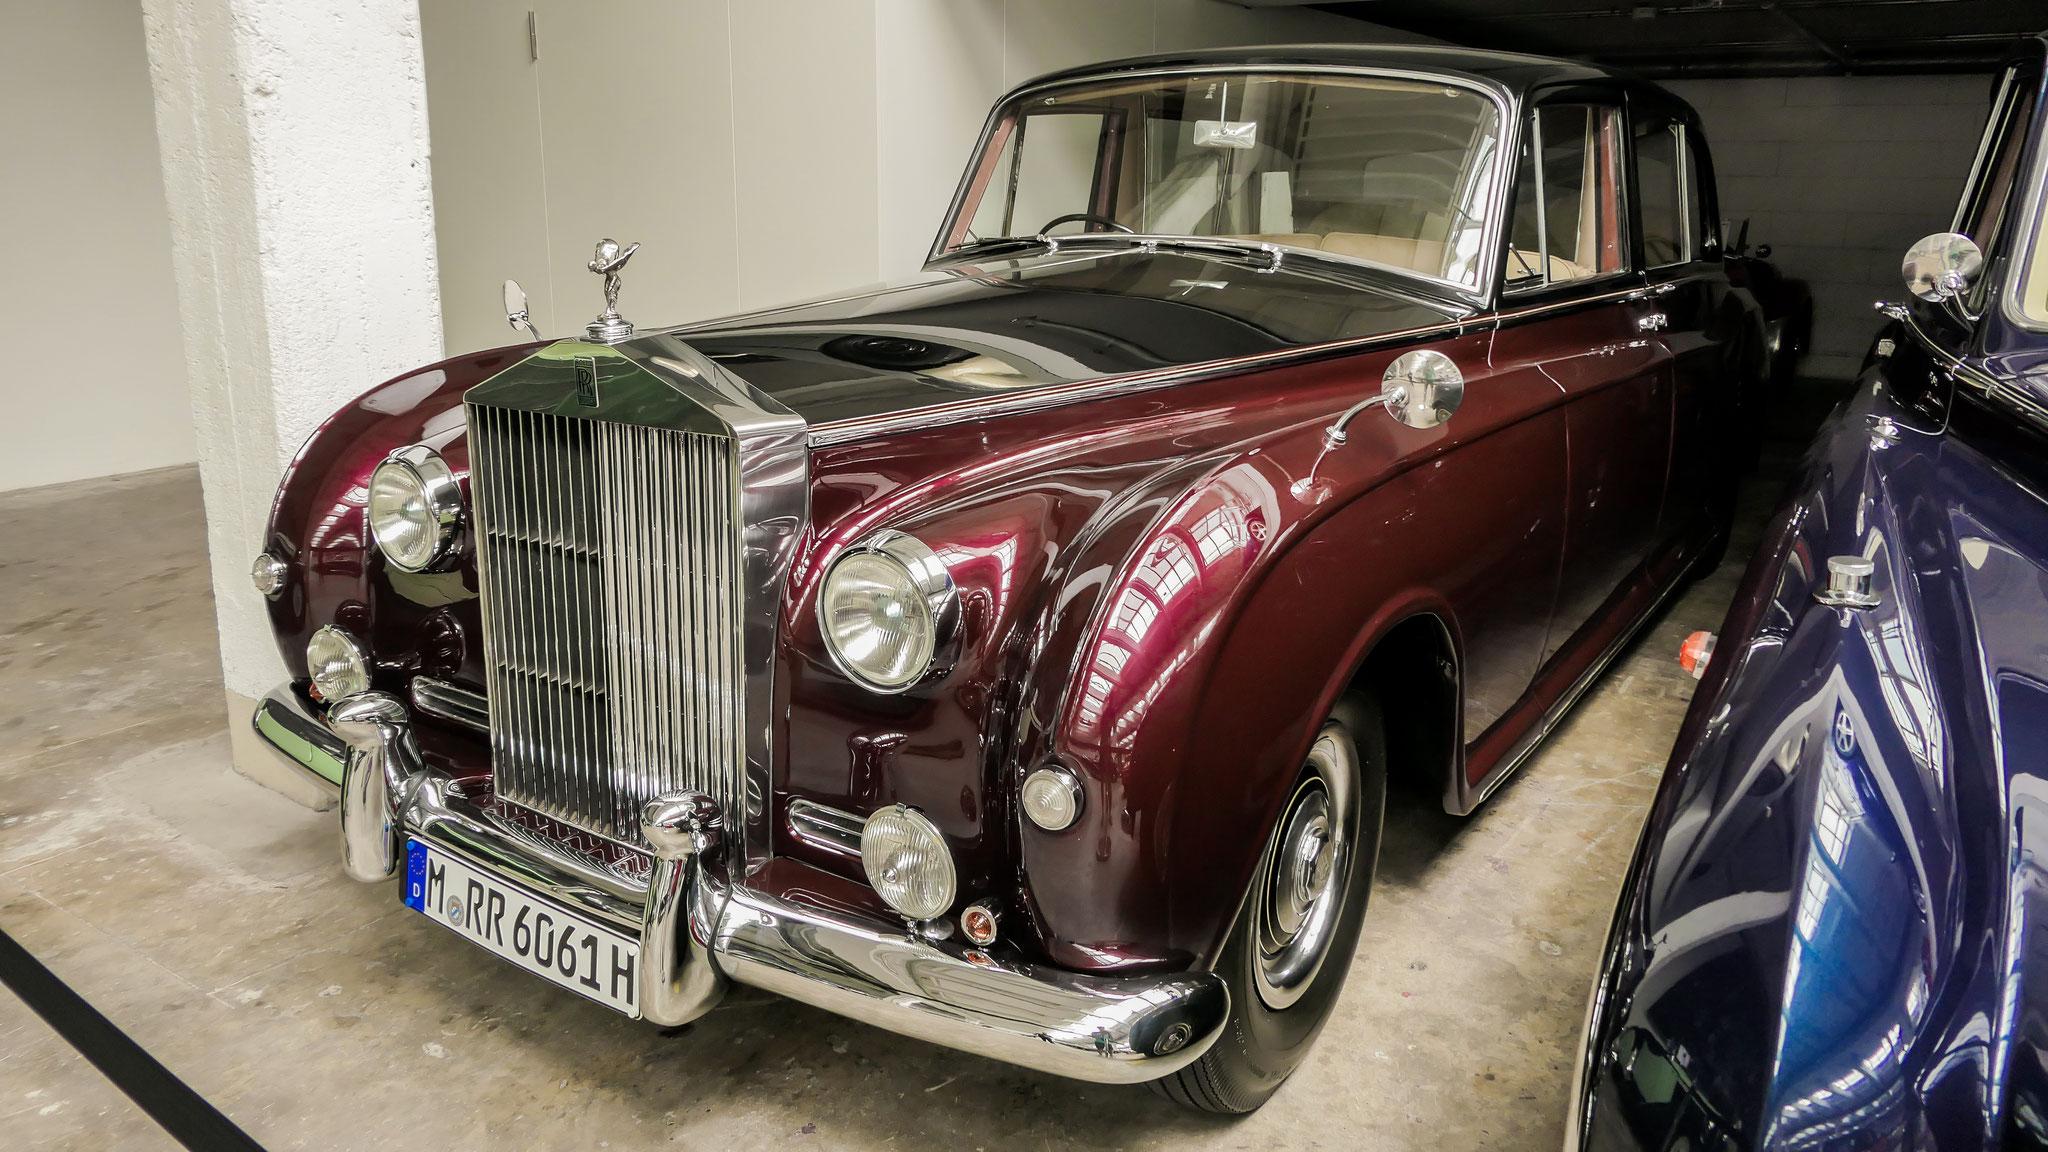 Rolls Royce Silver Cloud I -M-RR-6061H